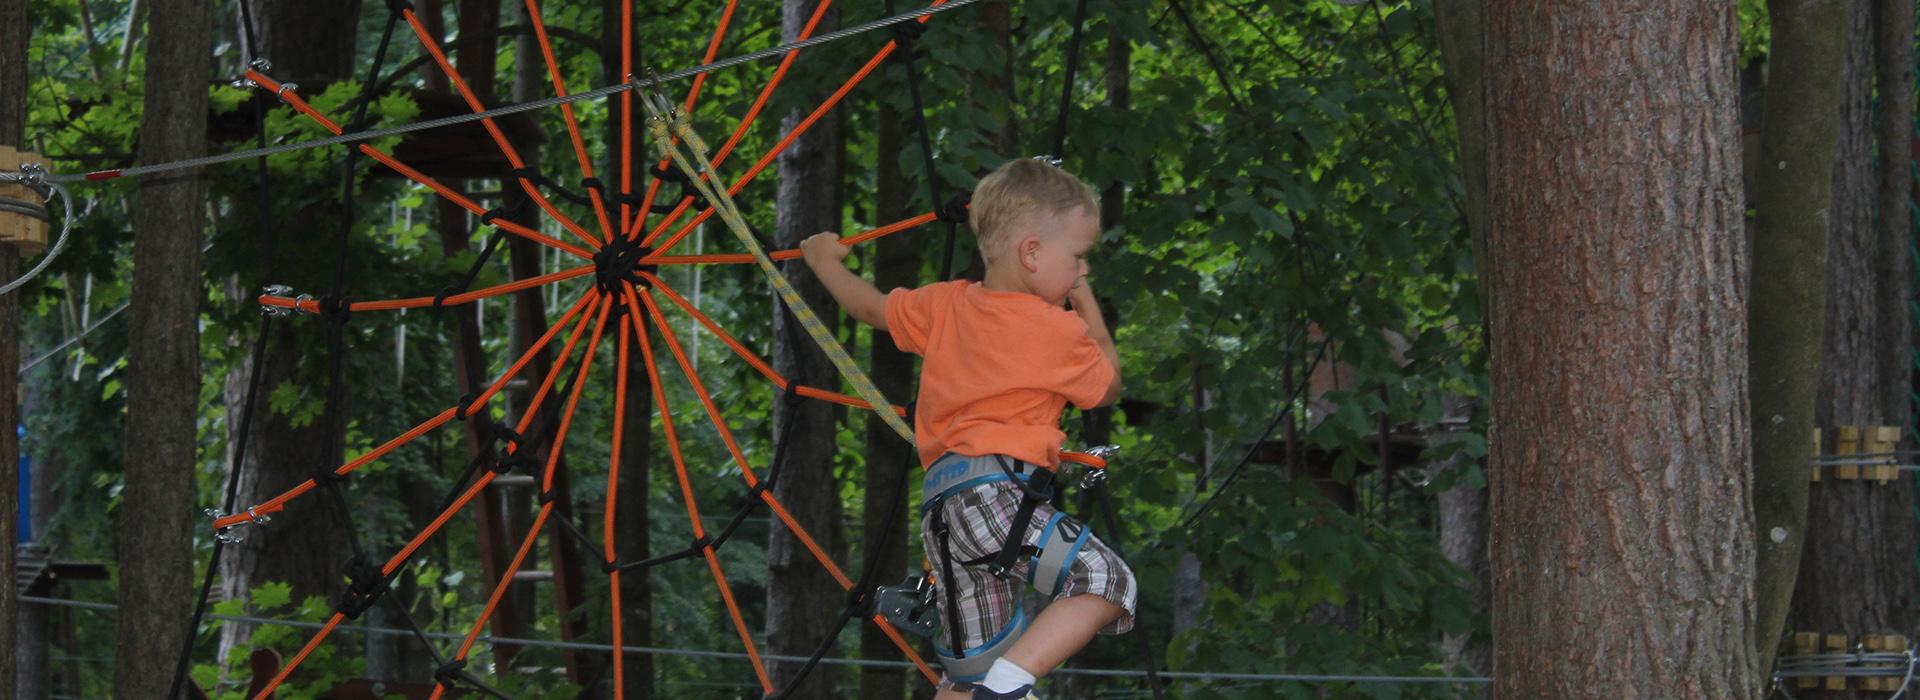 4 year kid climbing